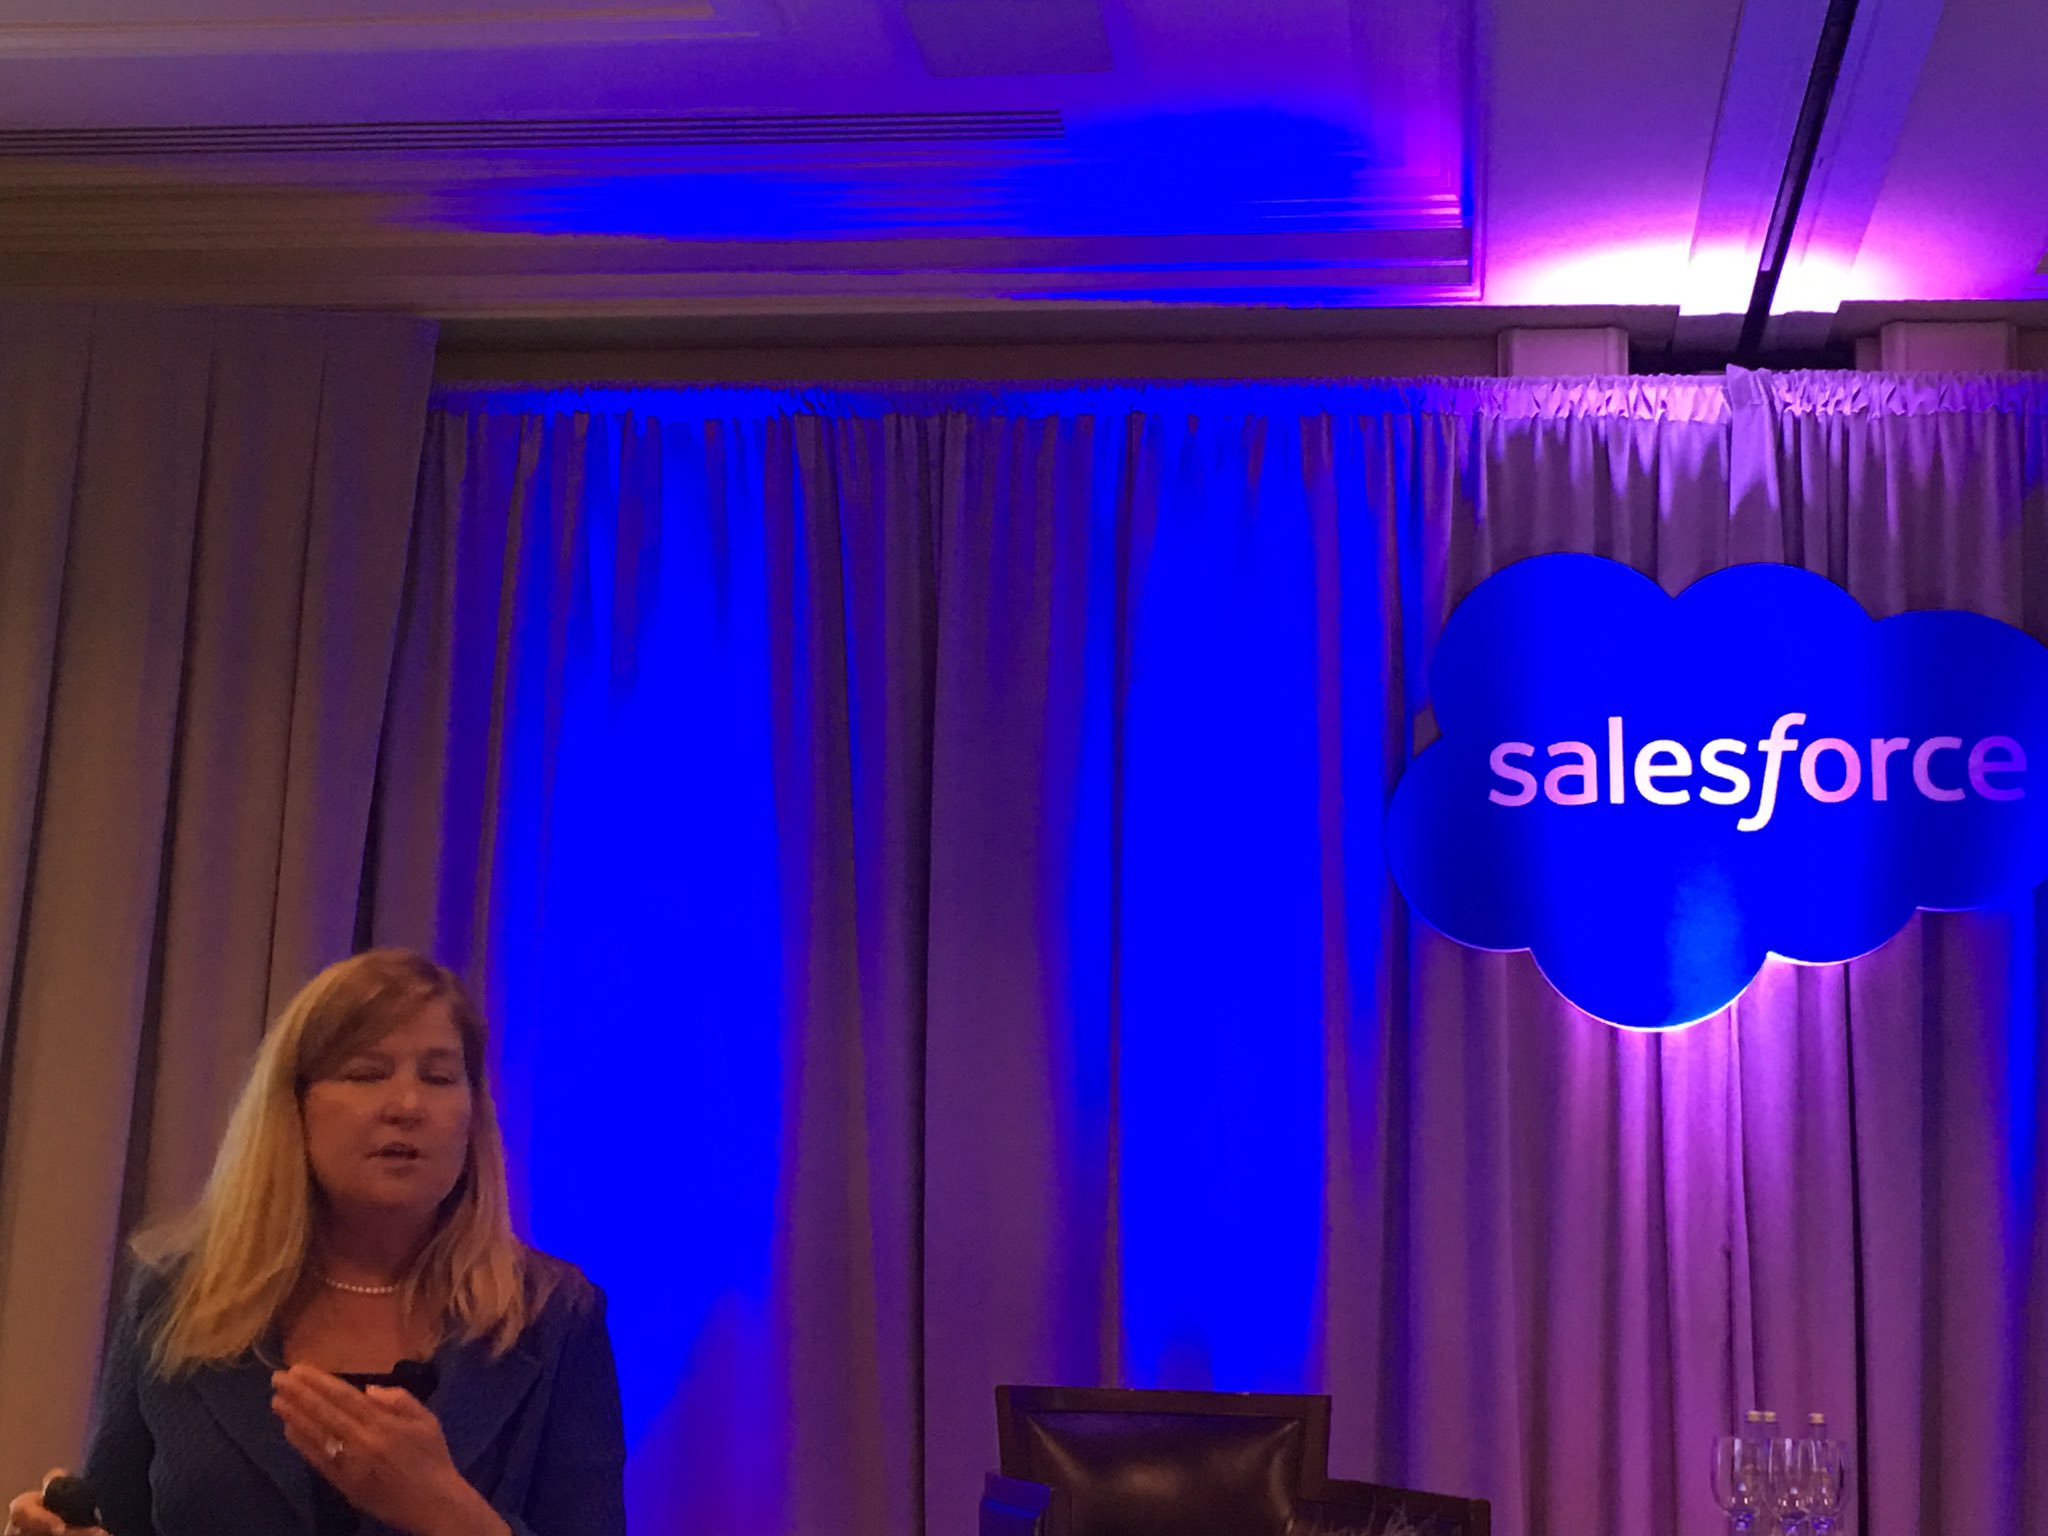 MyPOV: @AXA @SchneiderElec @EnelGroup @SparkNZ are good #DigitalTransformation examples from @polly_sumner @salesforce #salesforcear https://t.co/PH8bajLcXh